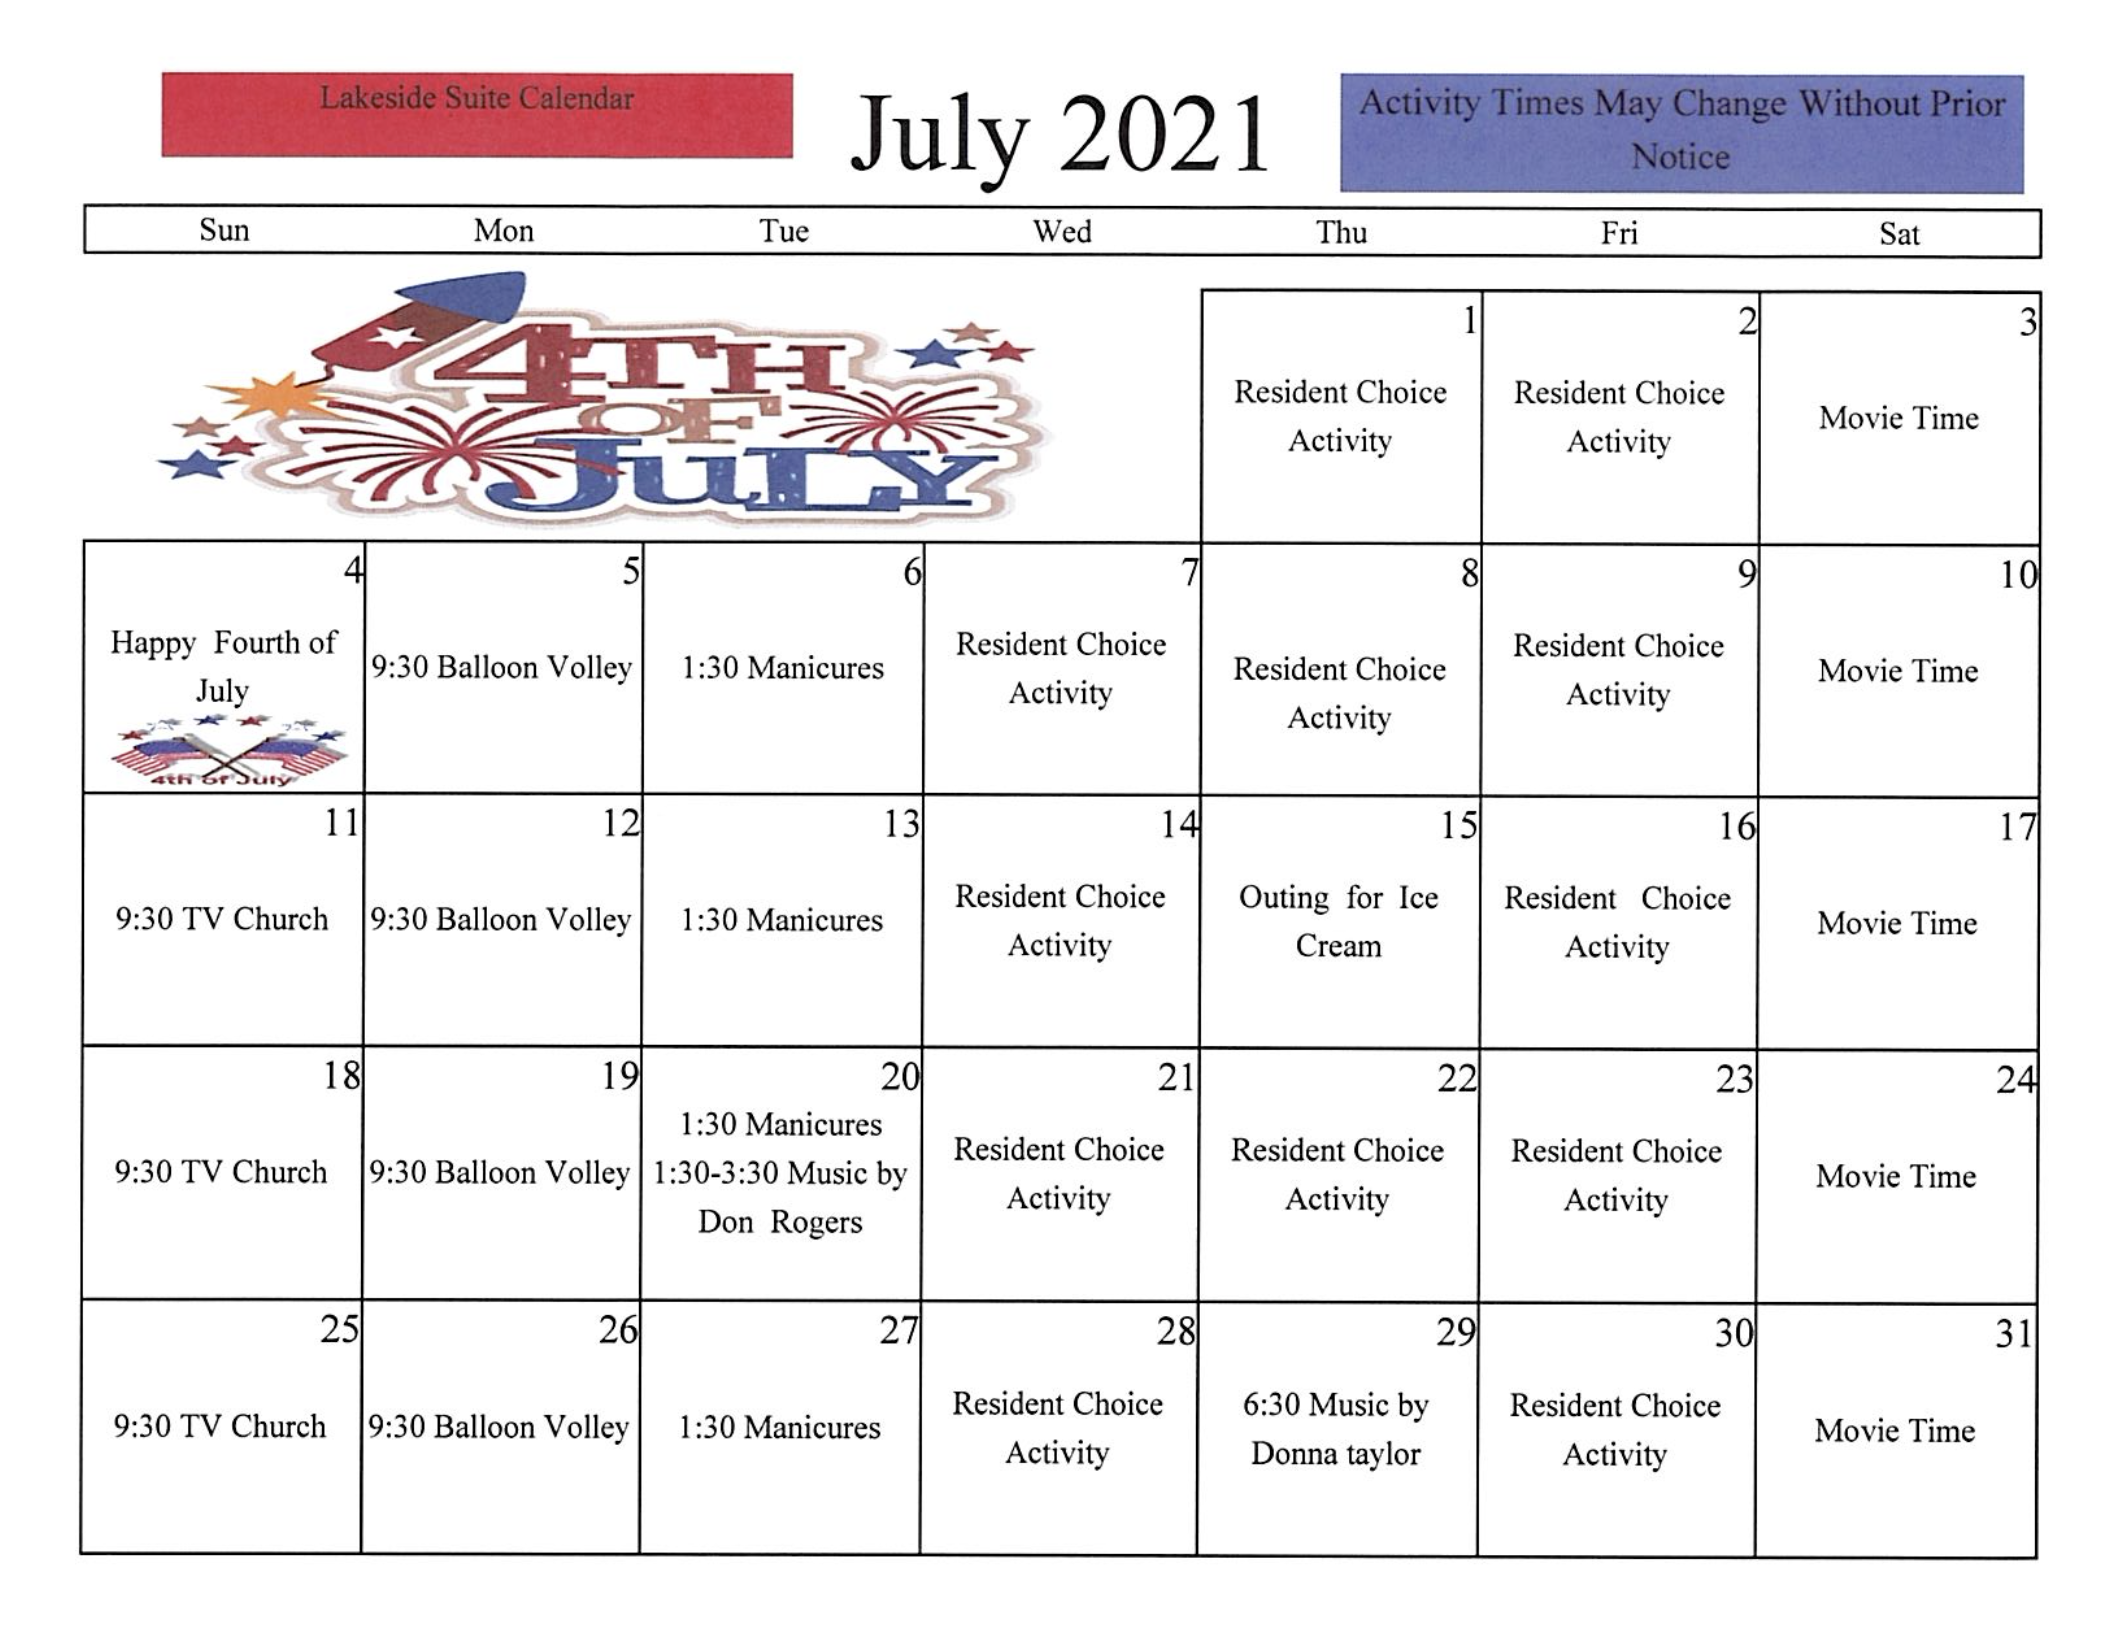 Lincoln Care Center Lakeside Suite July 2021 Calendar